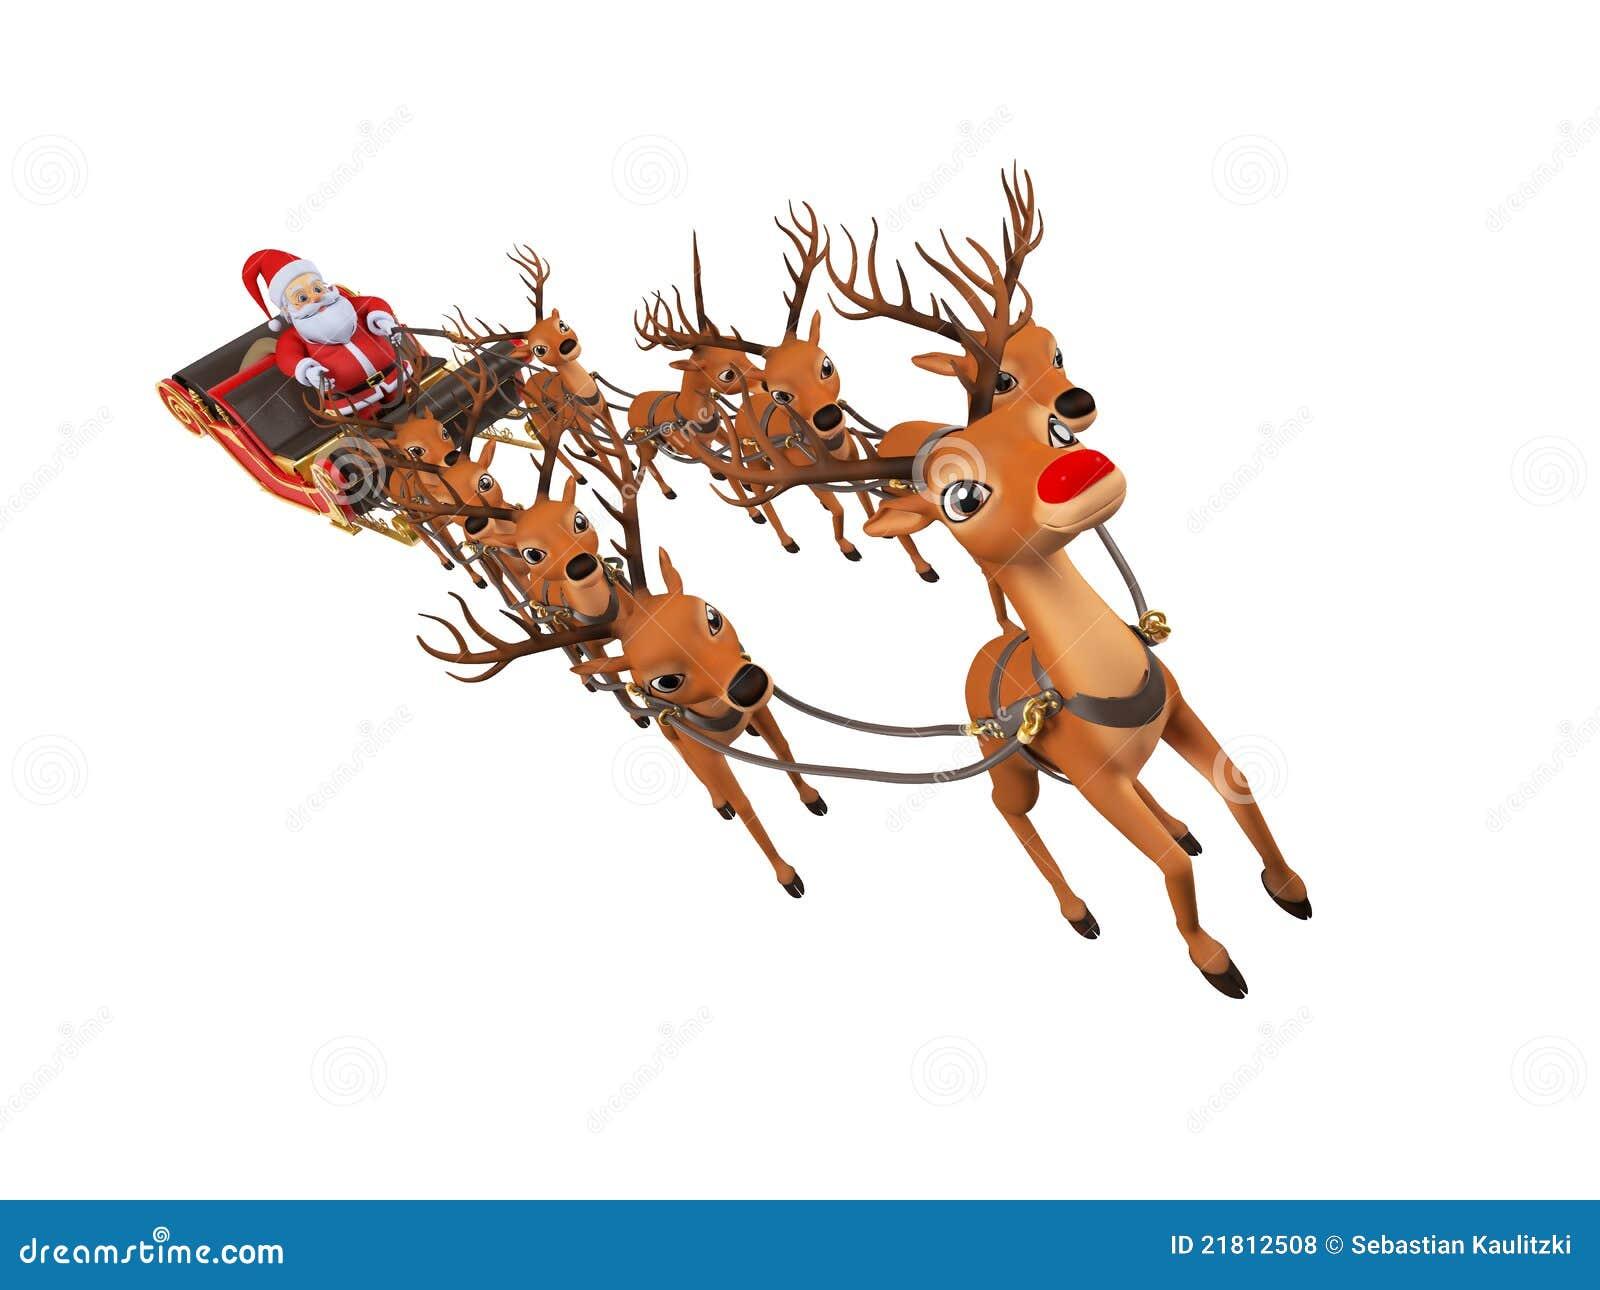 1300 x 1065 jpeg 108kB, Santa With His Sleigh Royalty Free Stock ...